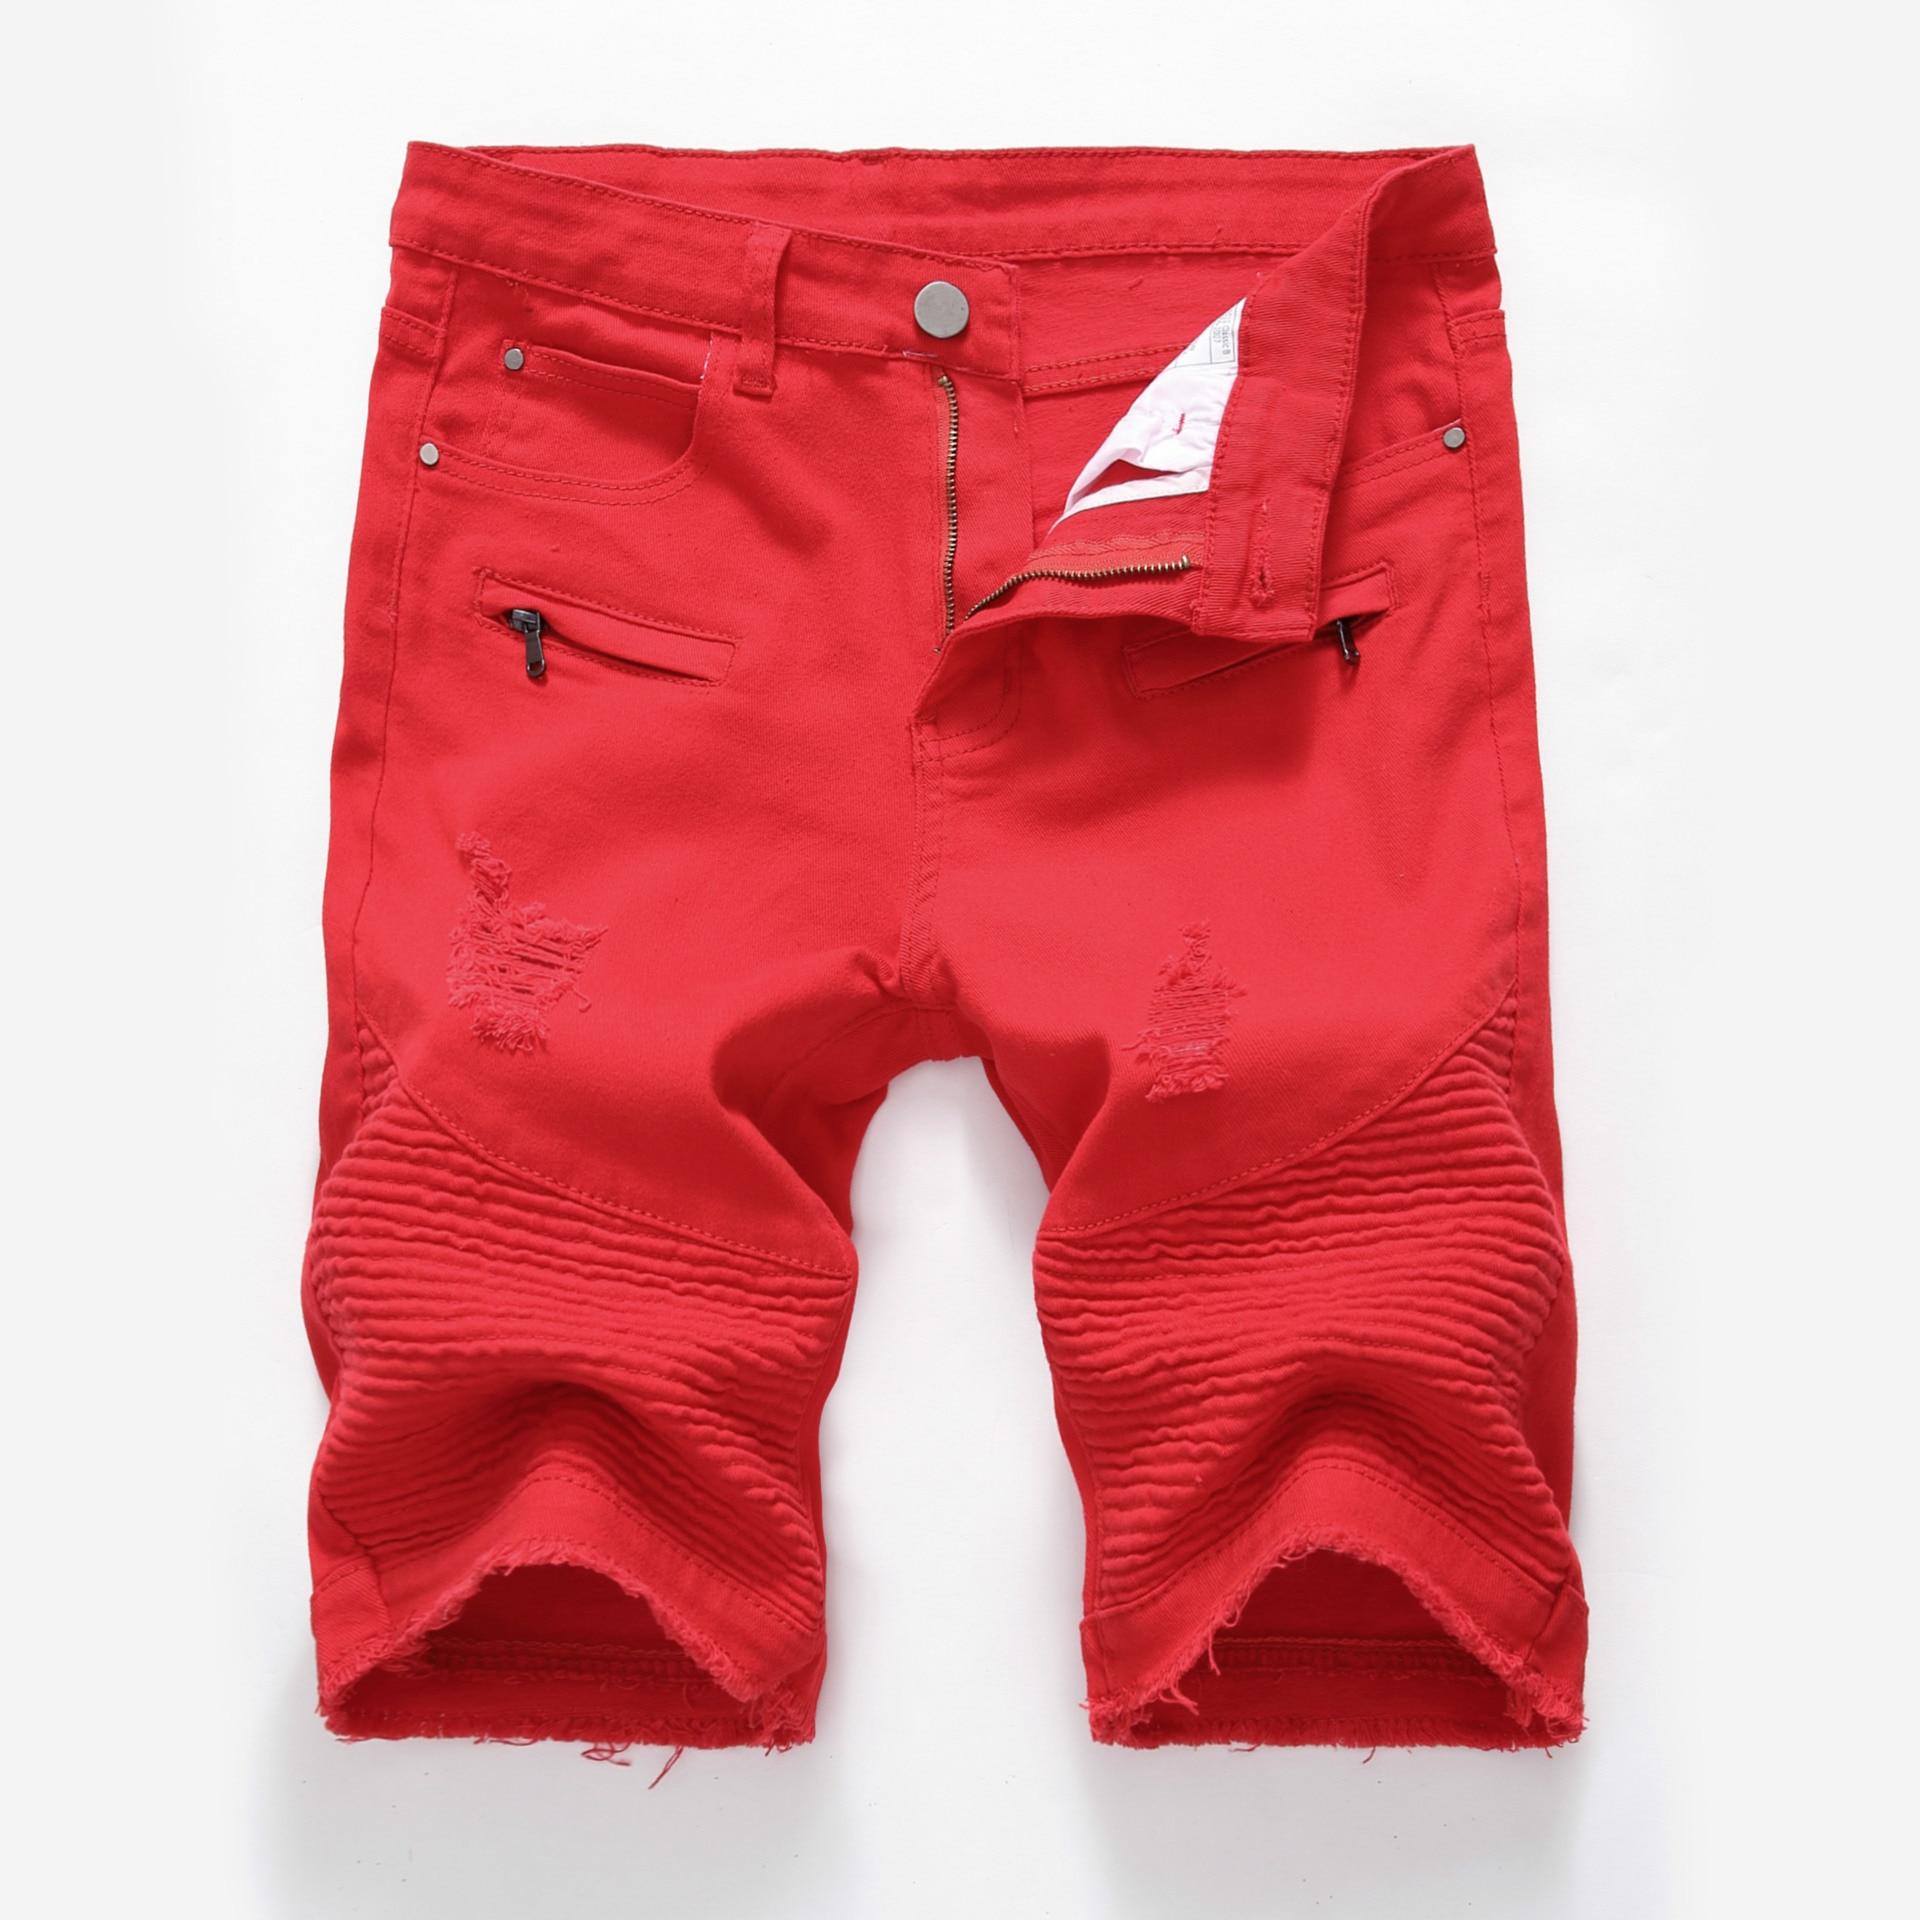 2020 Summer New Men's Denim Shorts Fashion Hole Elastic Force Short Jeans Male Zipper Decoration Brand White Black Red